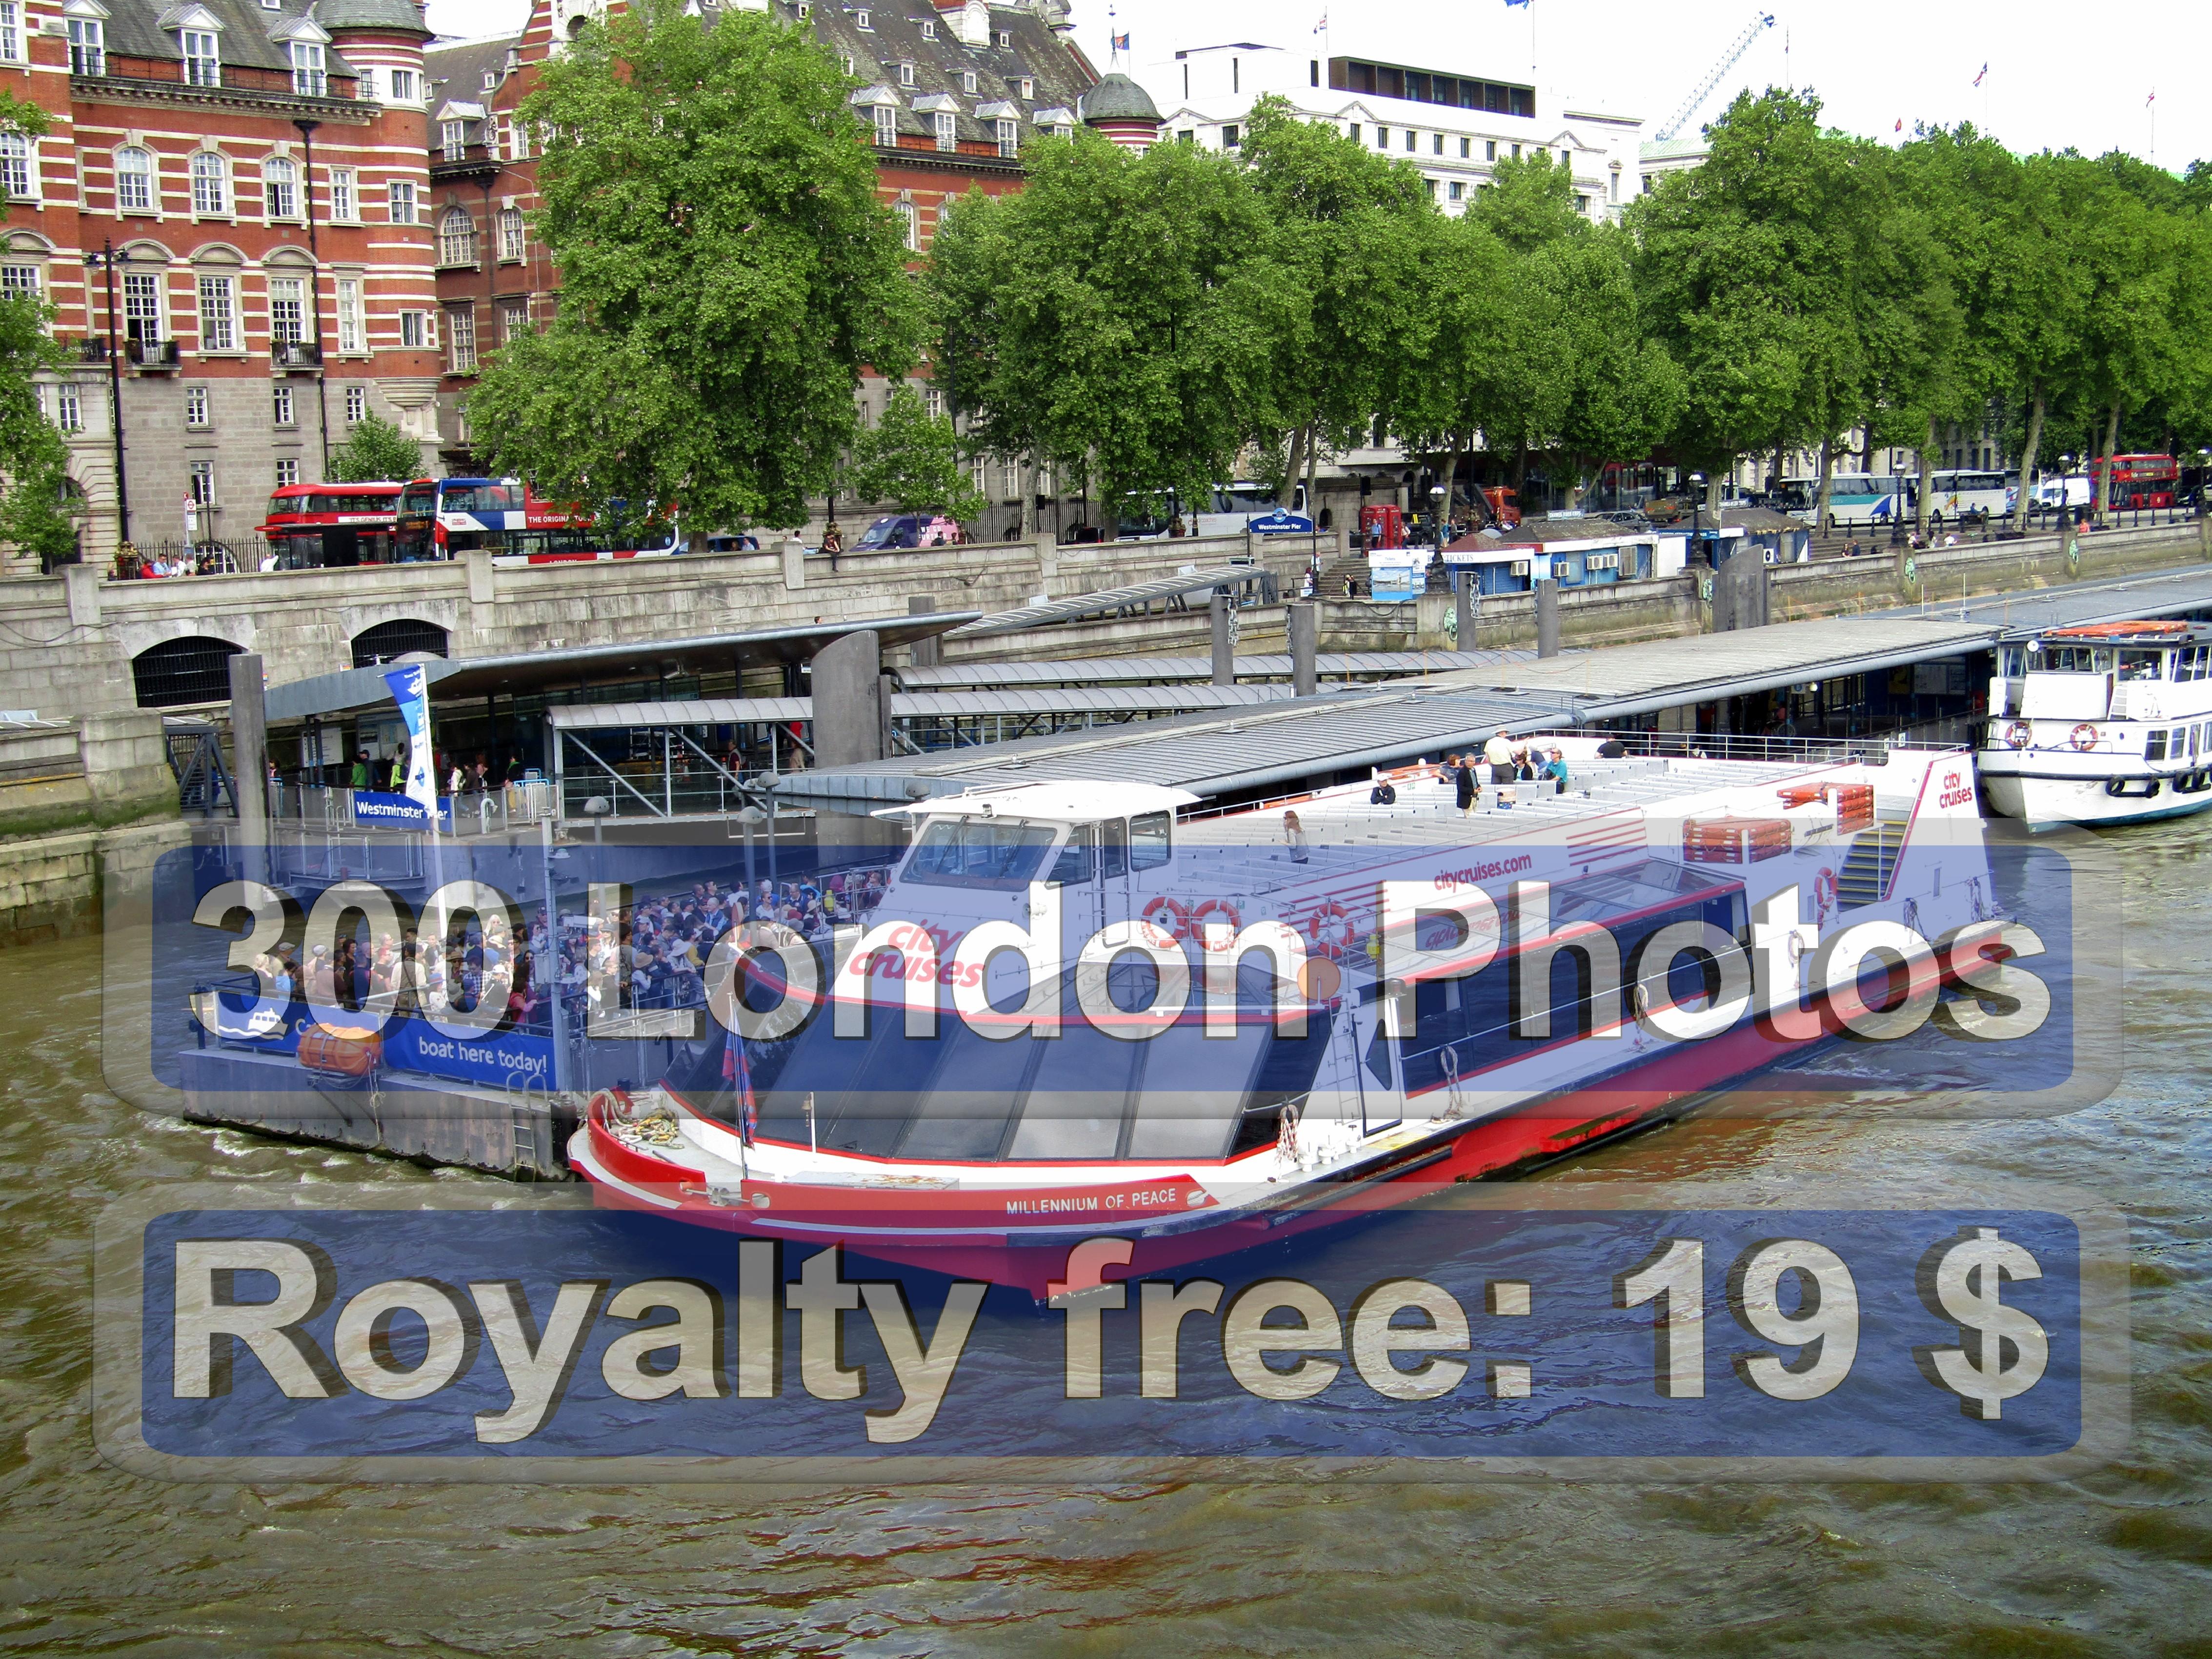 London Drugs Photo Lab Promo Code